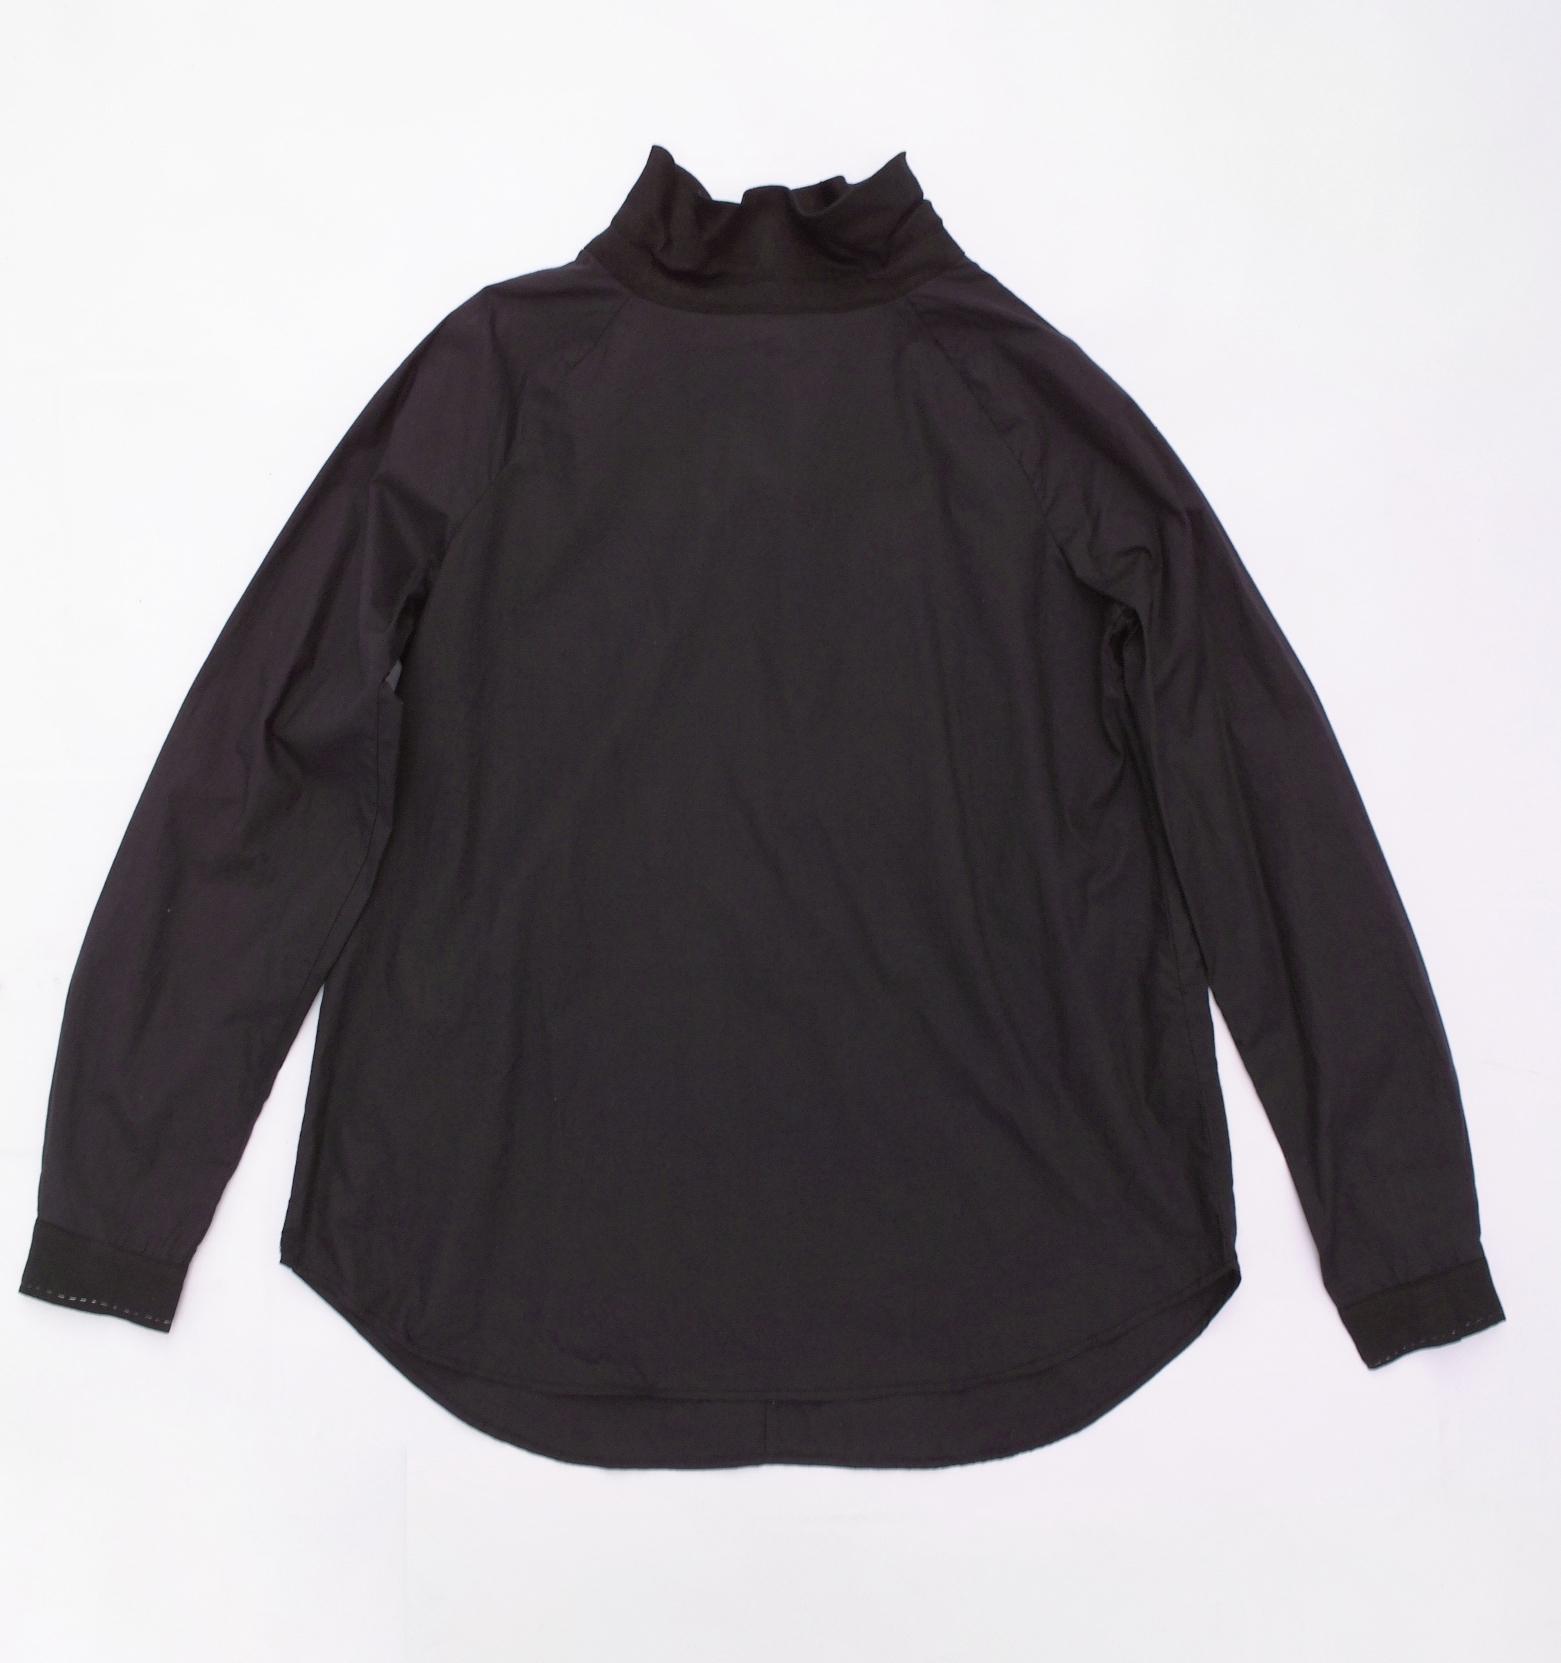 High neck gather blouse